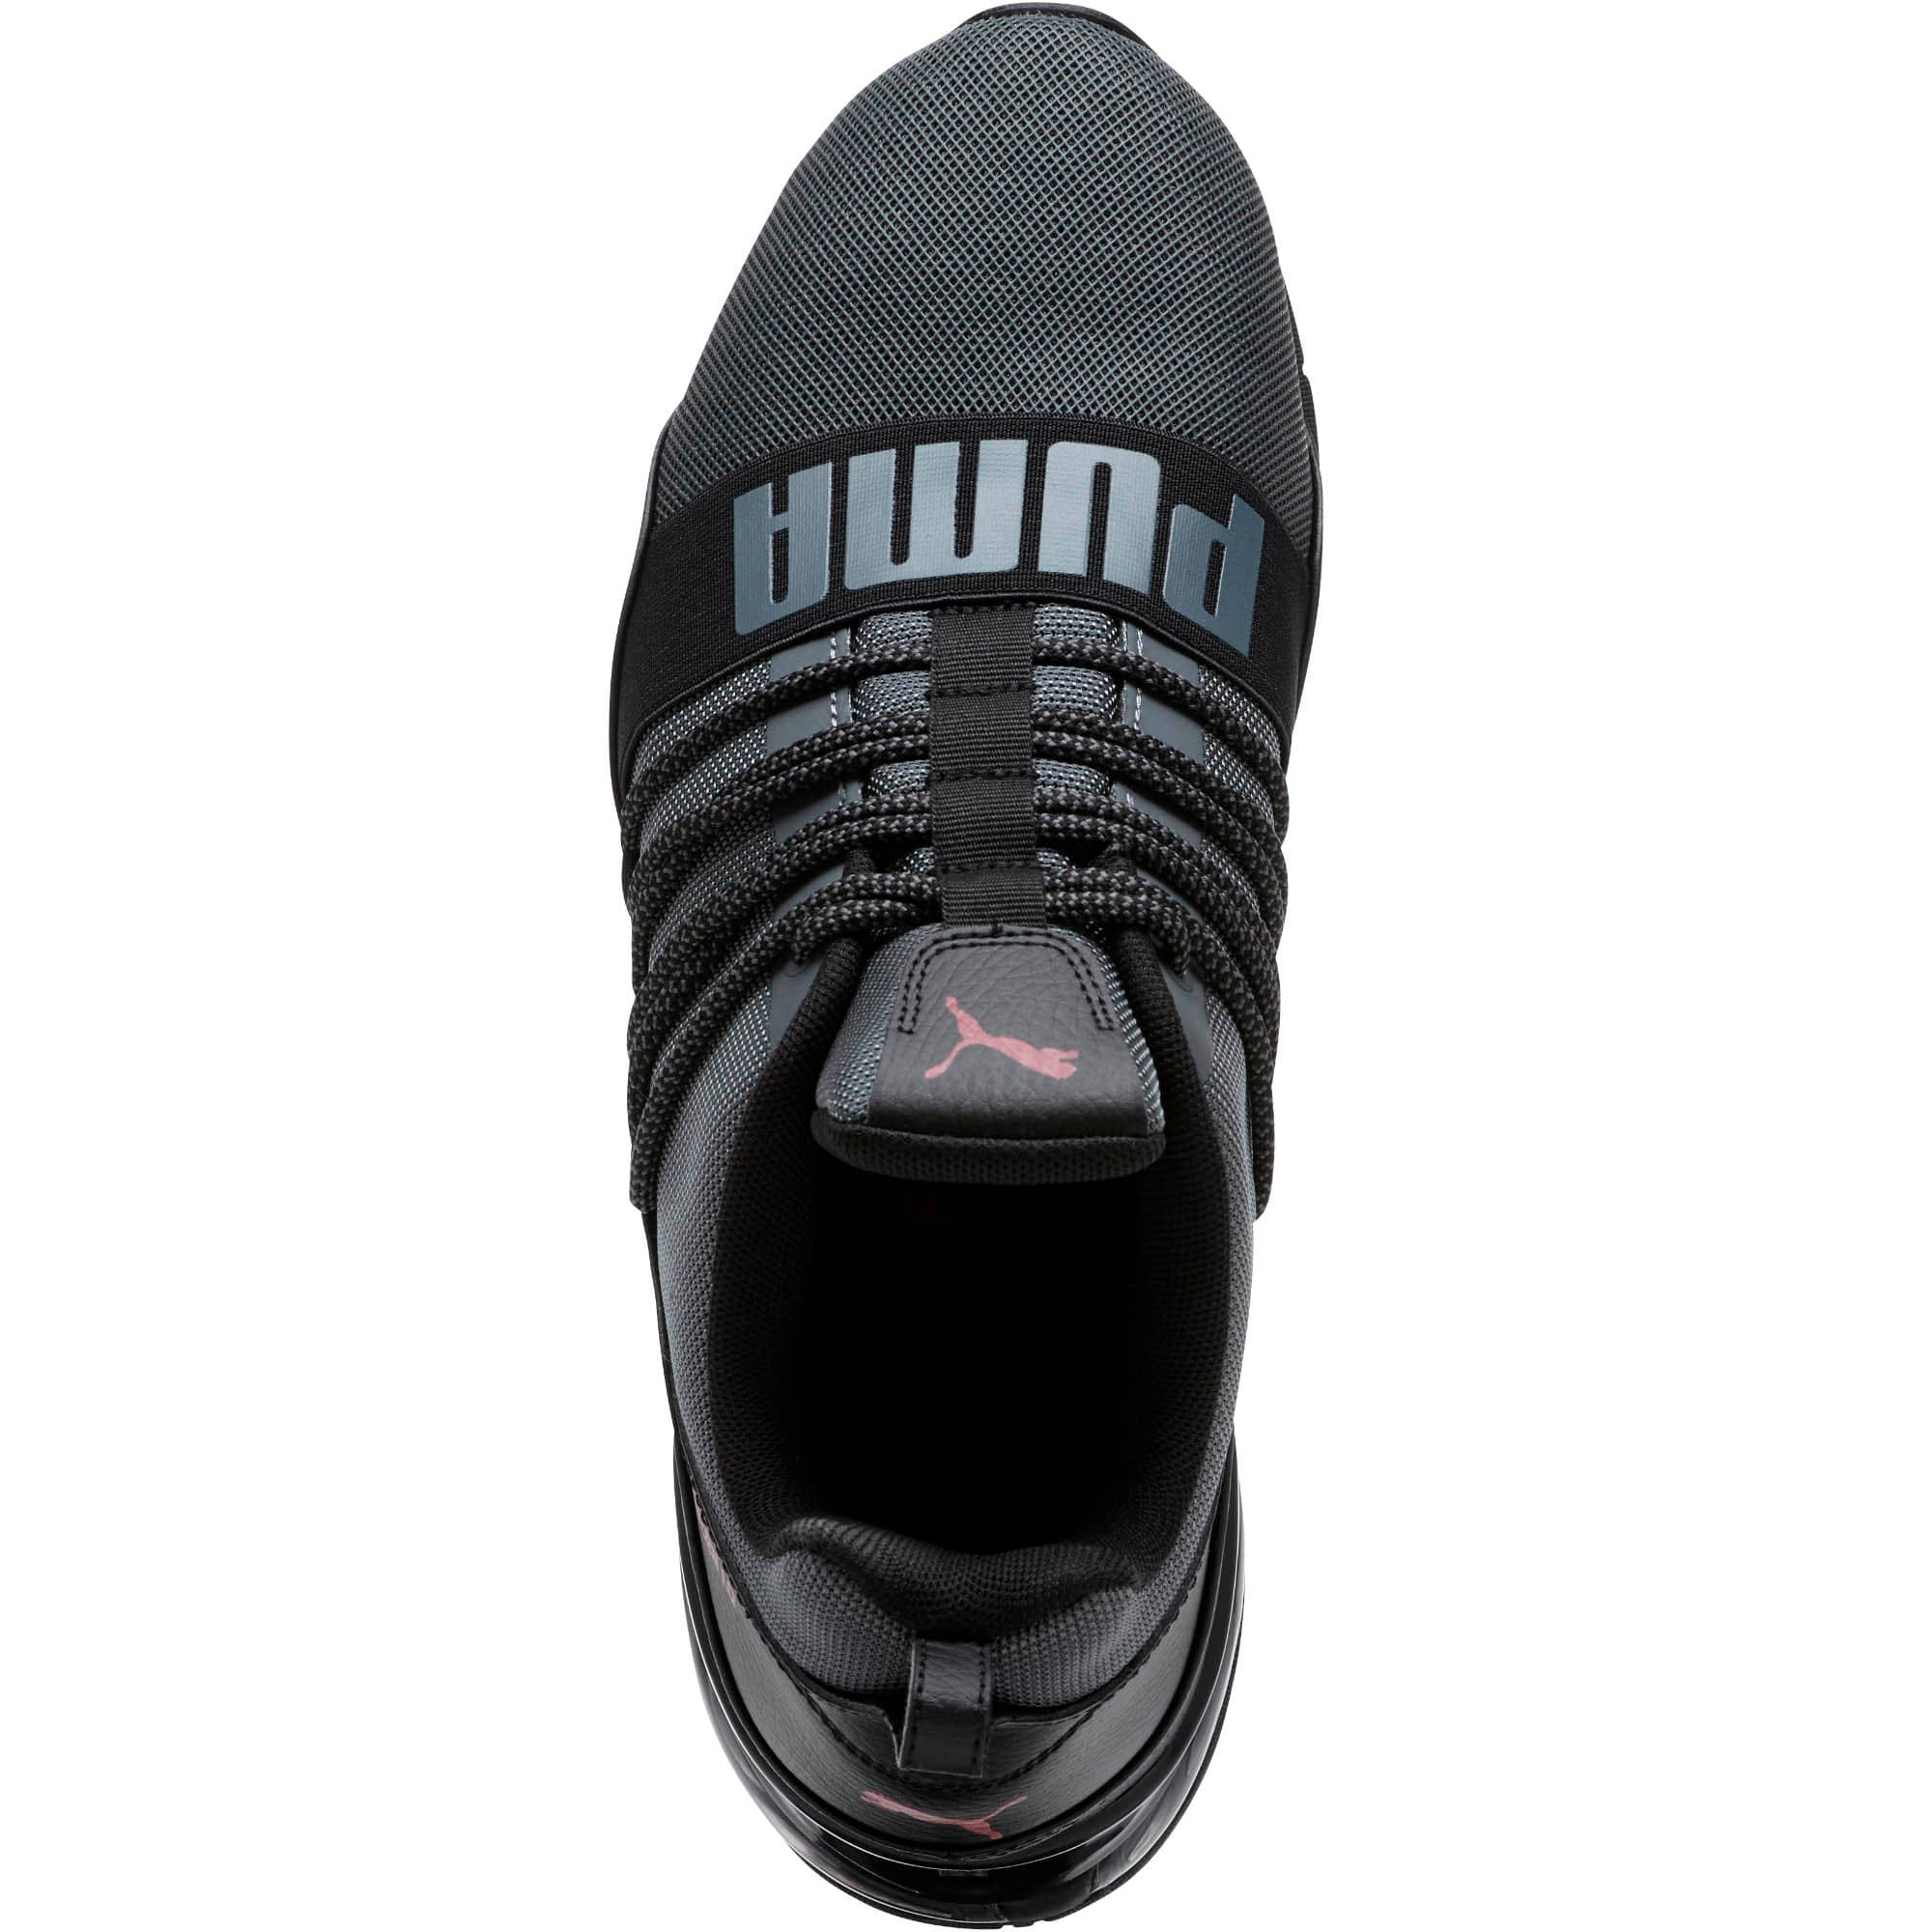 Thumbnail 5 of Cell Regulate KRM Men's Running Shoes, IronGate-PumaBlack-Pomegrnt, medium